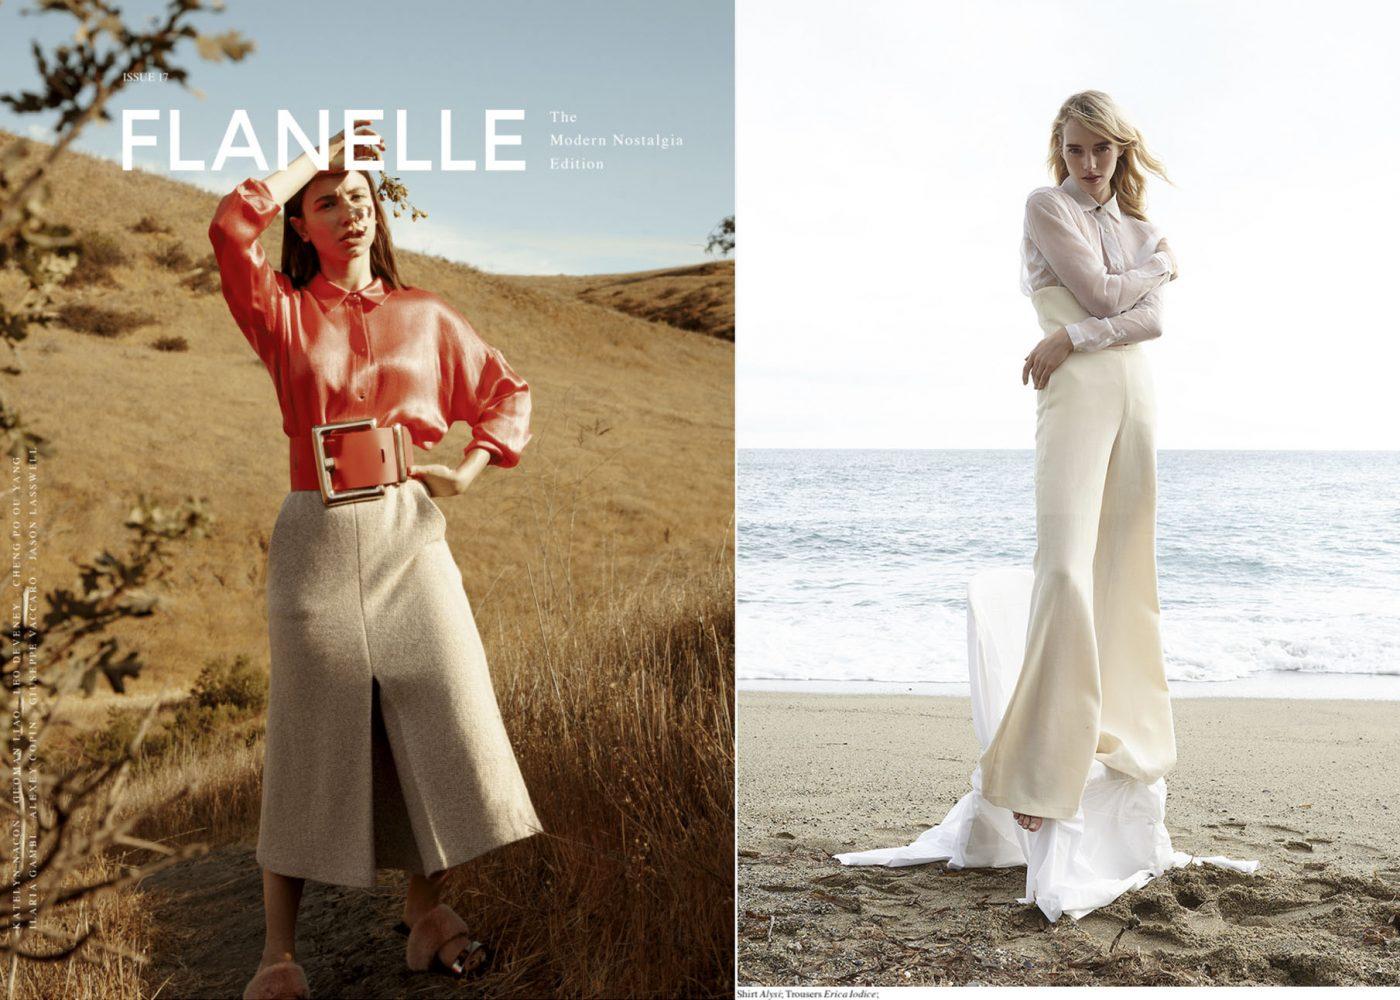 Flanelle Magazine n°17